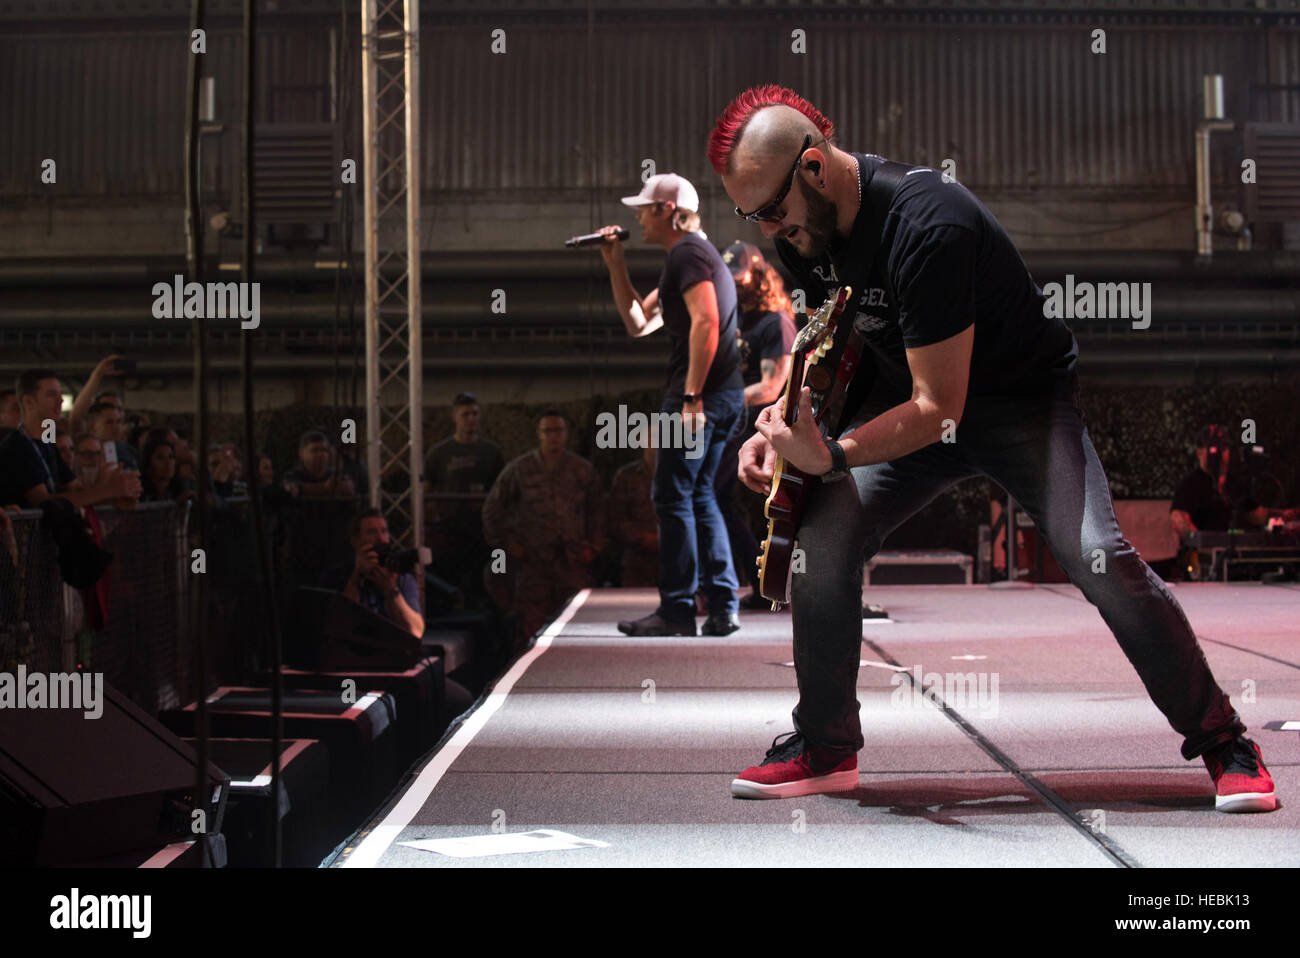 Members of 3 Doors Down an American rock band from Escatawpa Miss. perform a show inside Hangar 1 at Spangdahlem Air Base Germany Oct. 16 2016. & Members of 3 Doors Down an American rock band from Escatawpa ... Pezcame.Com